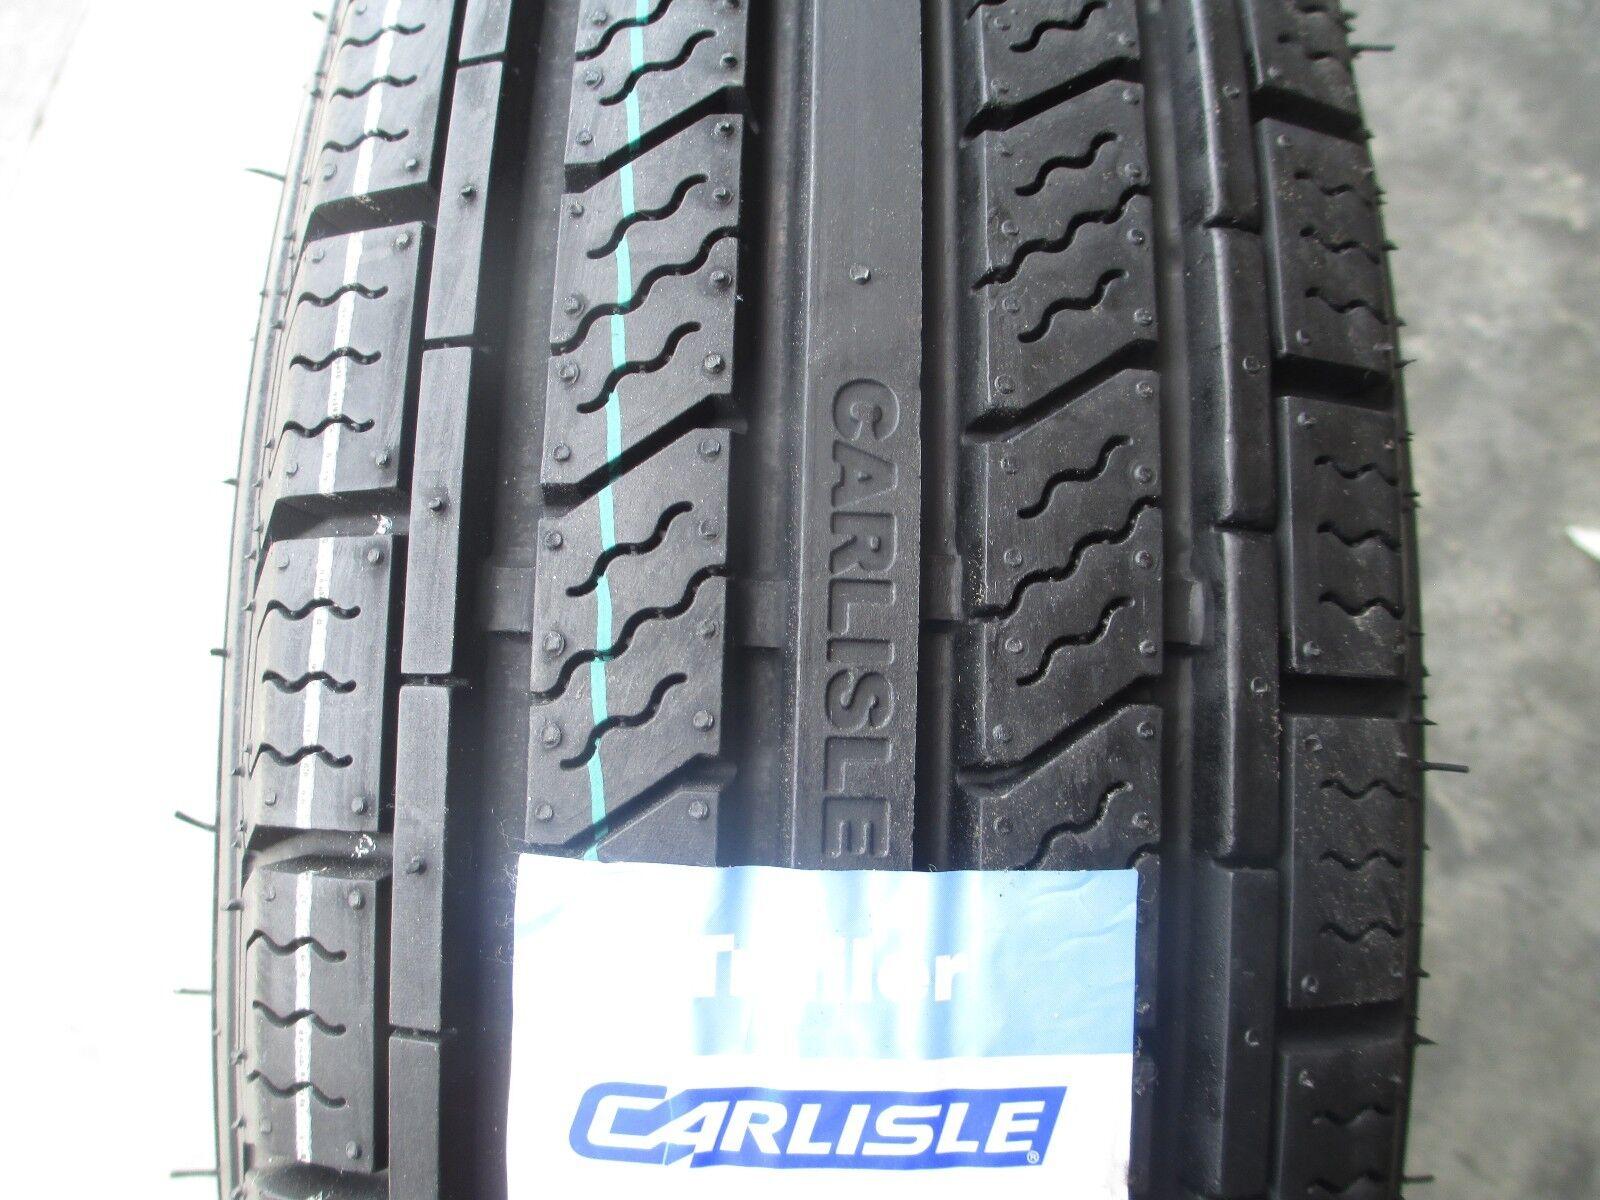 4 New ST 205/75R15 Carlisle Radial HD Trailer Tires 8 Ply 2057515 75 15 R15 D